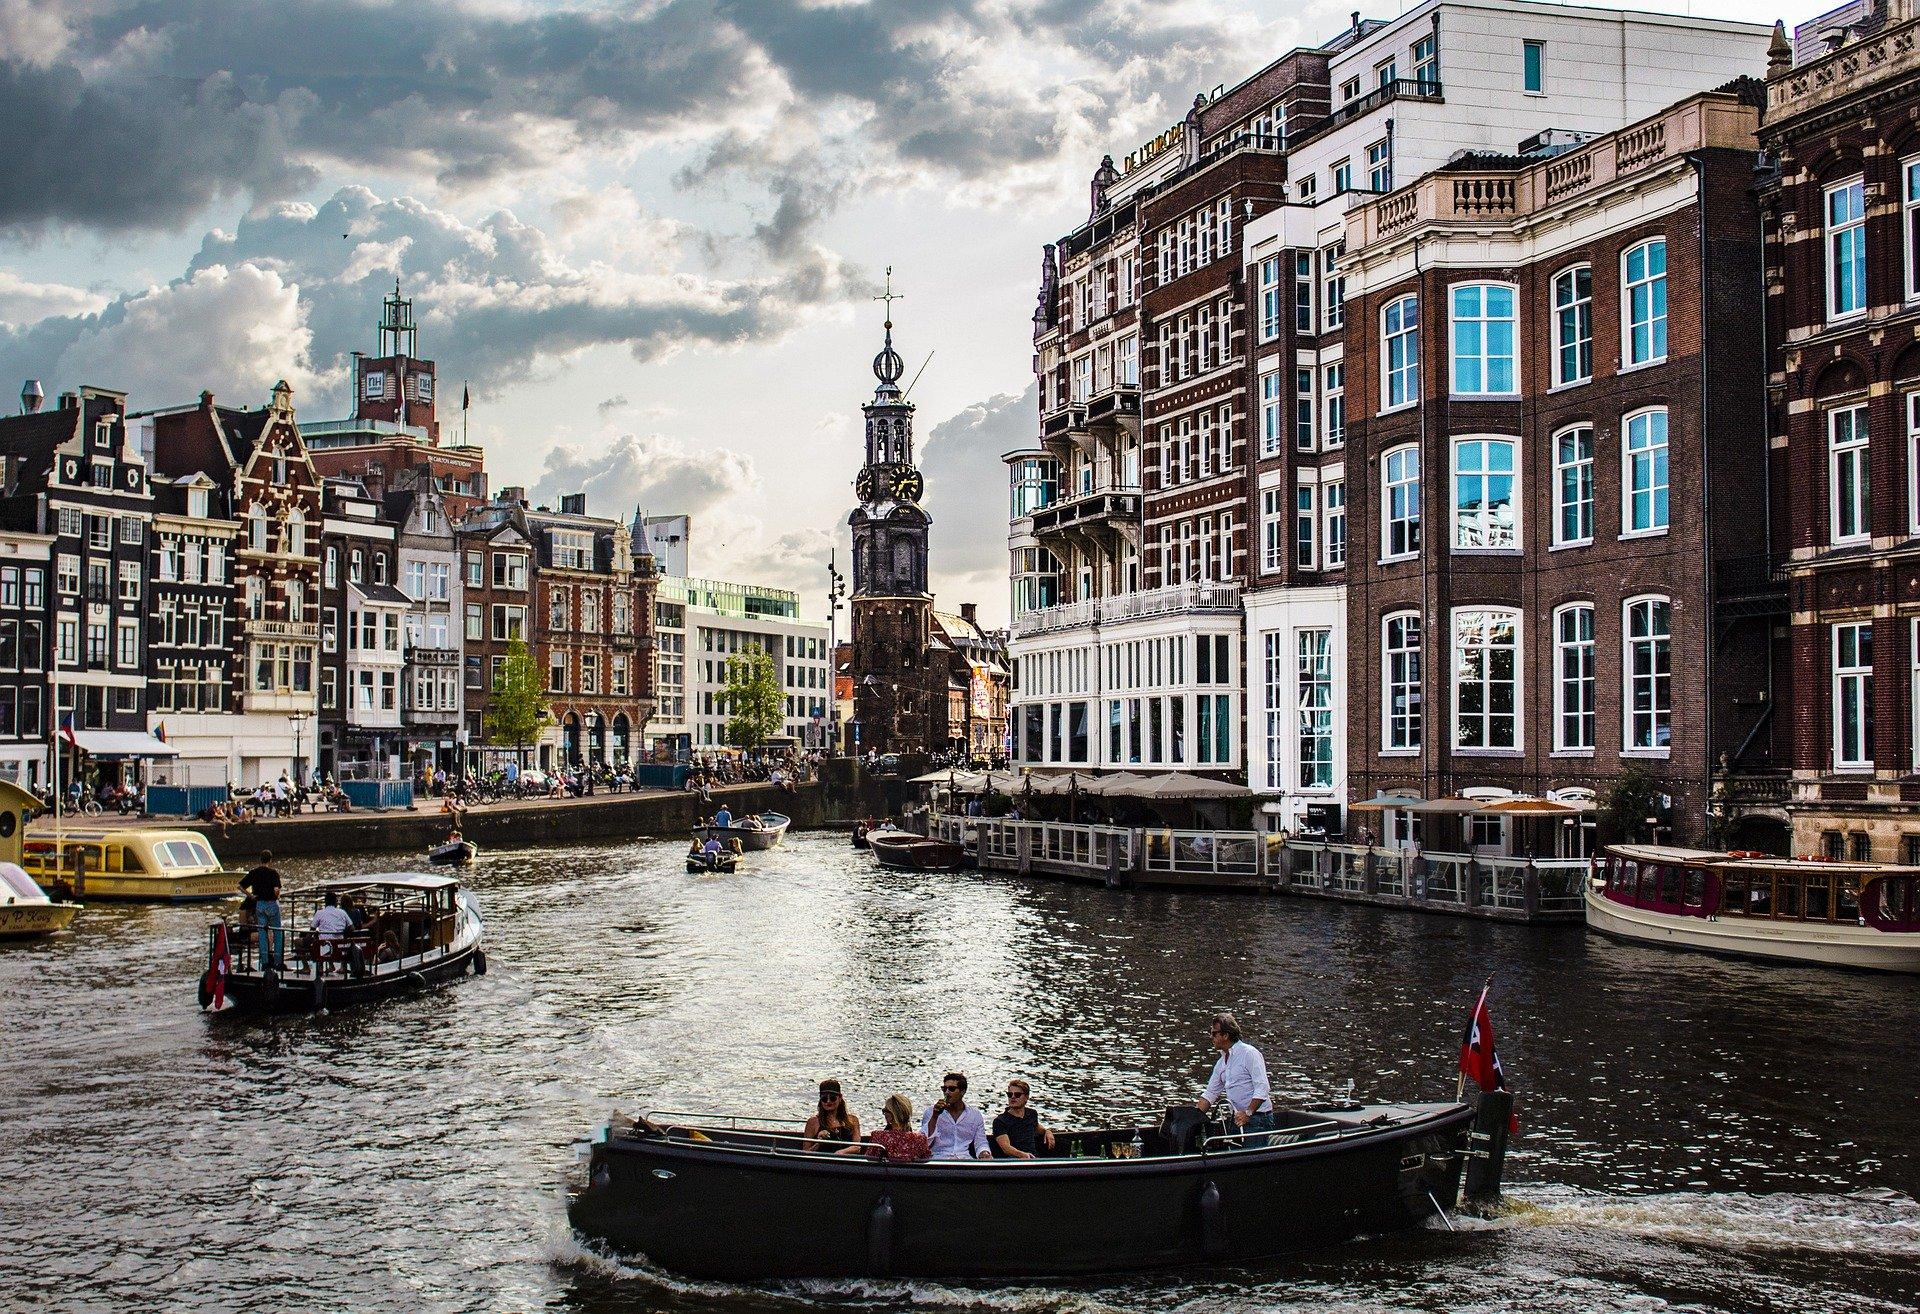 Tipy na výlet v Amsterdamu